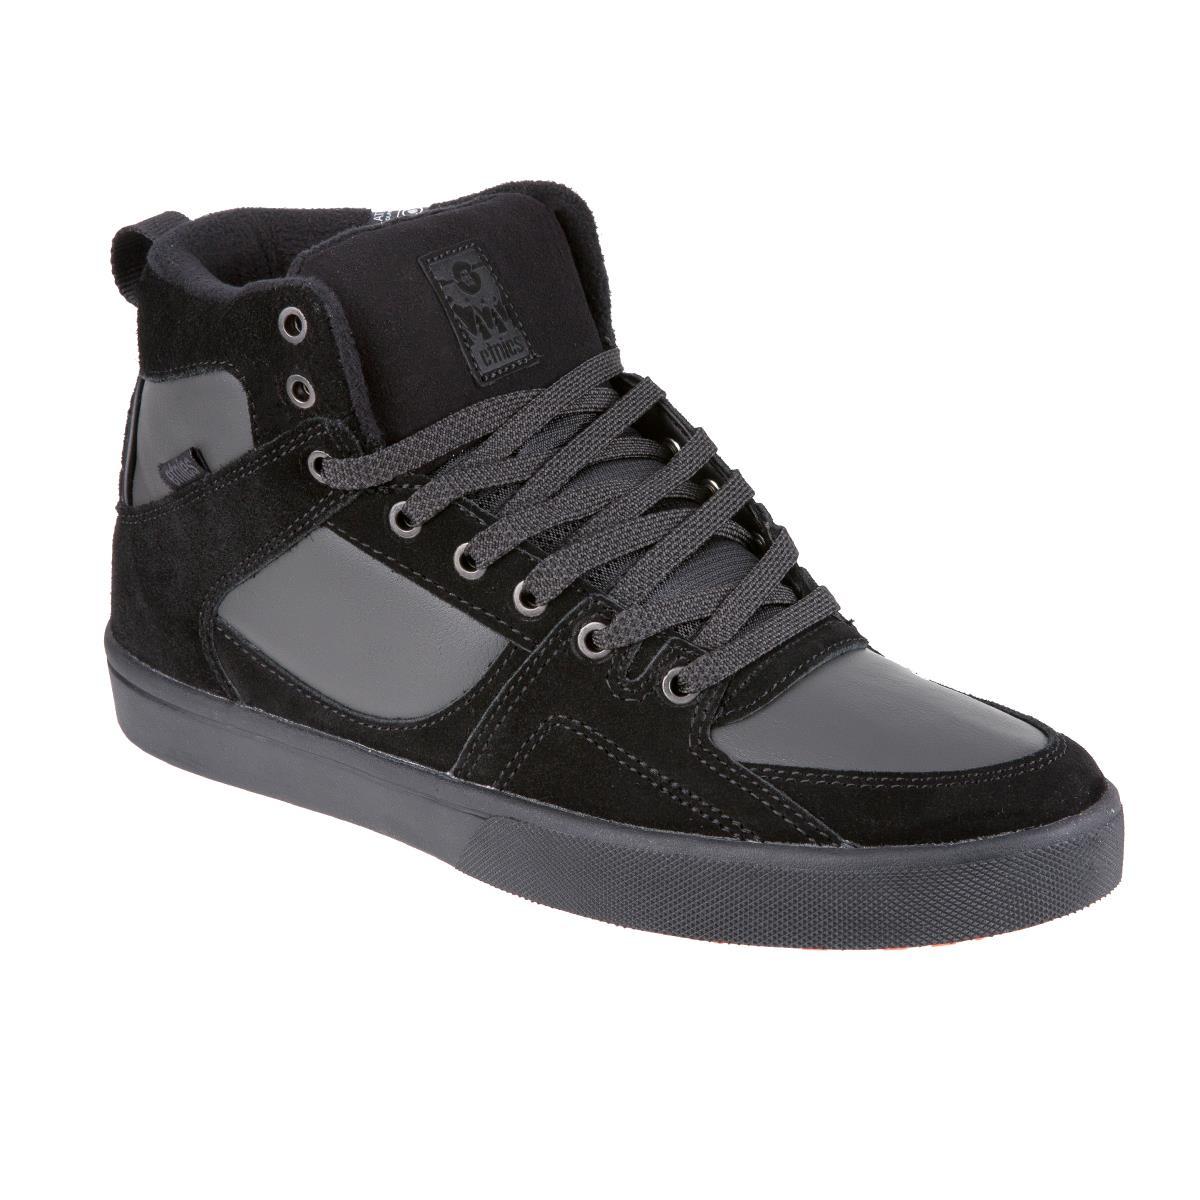 Etnies Winter Shoes Harrison HTW Black/Dark Grey/Gum